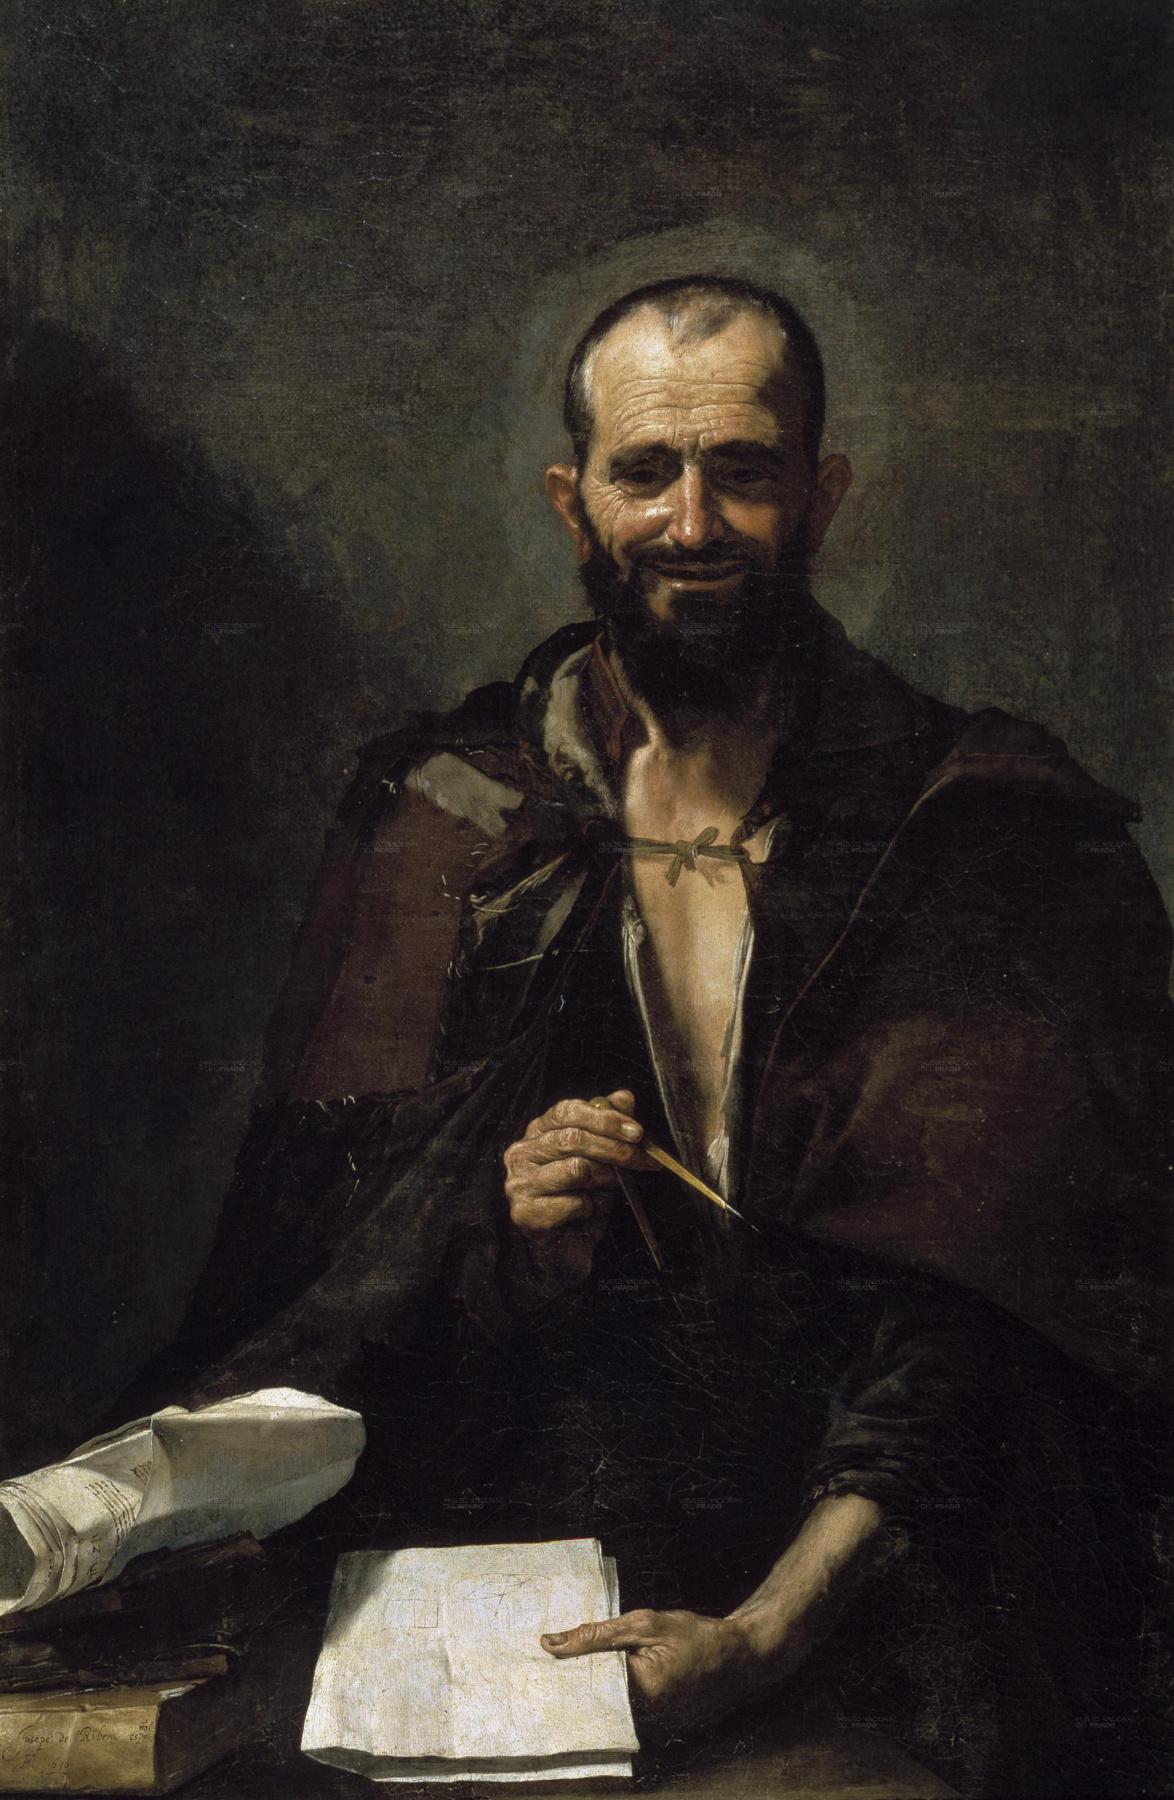 Jose de Ribera. Democritus